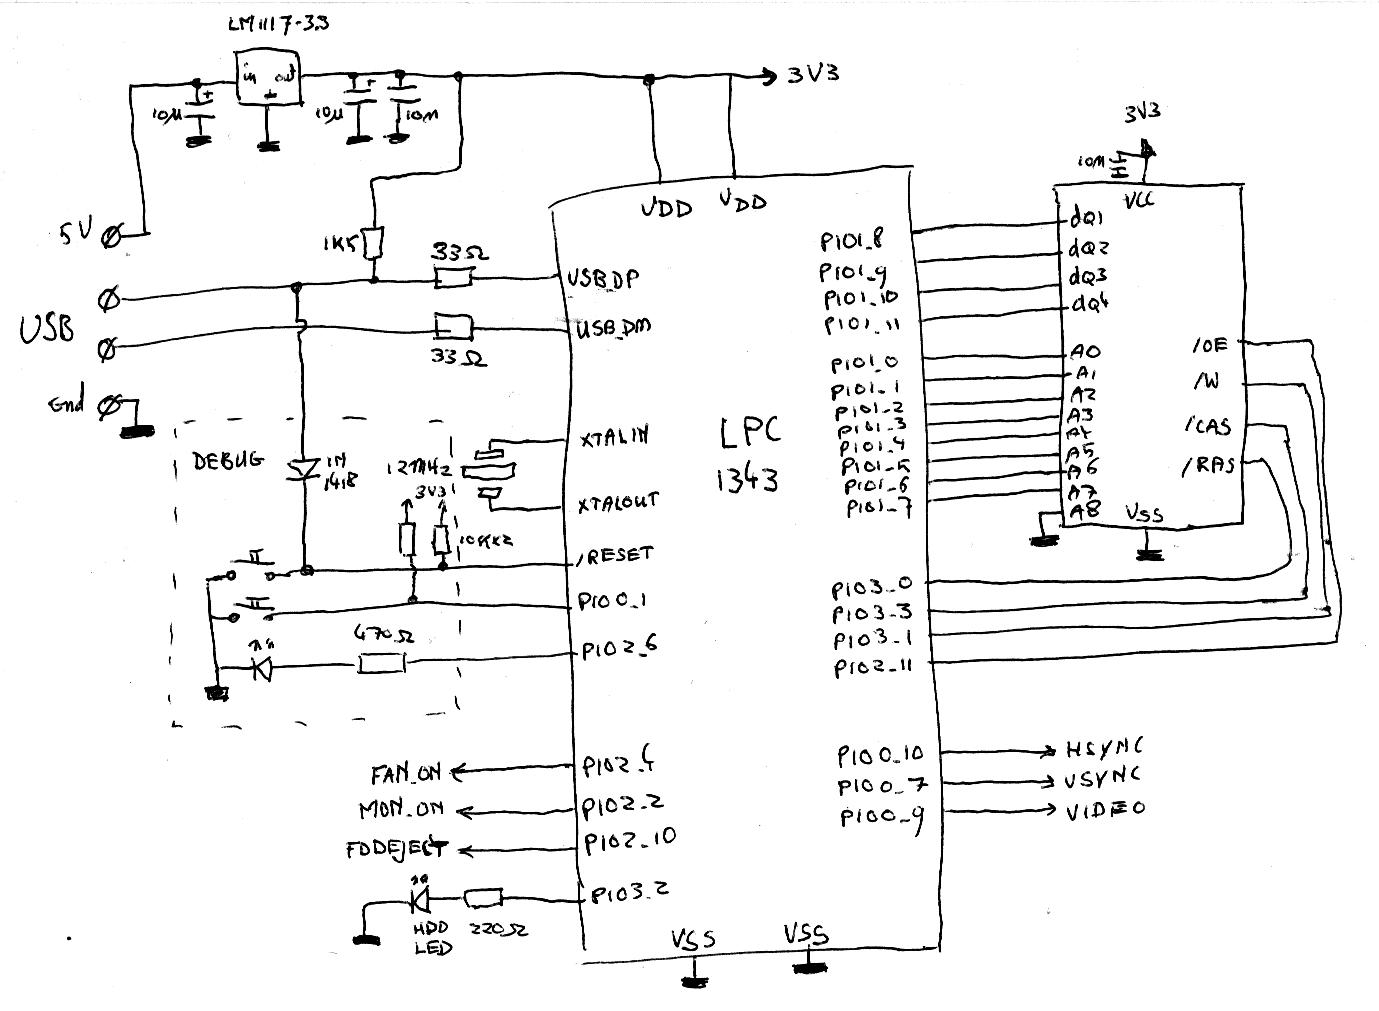 gpu schematic sprites mods - macintosh se/arm - the gpu #8